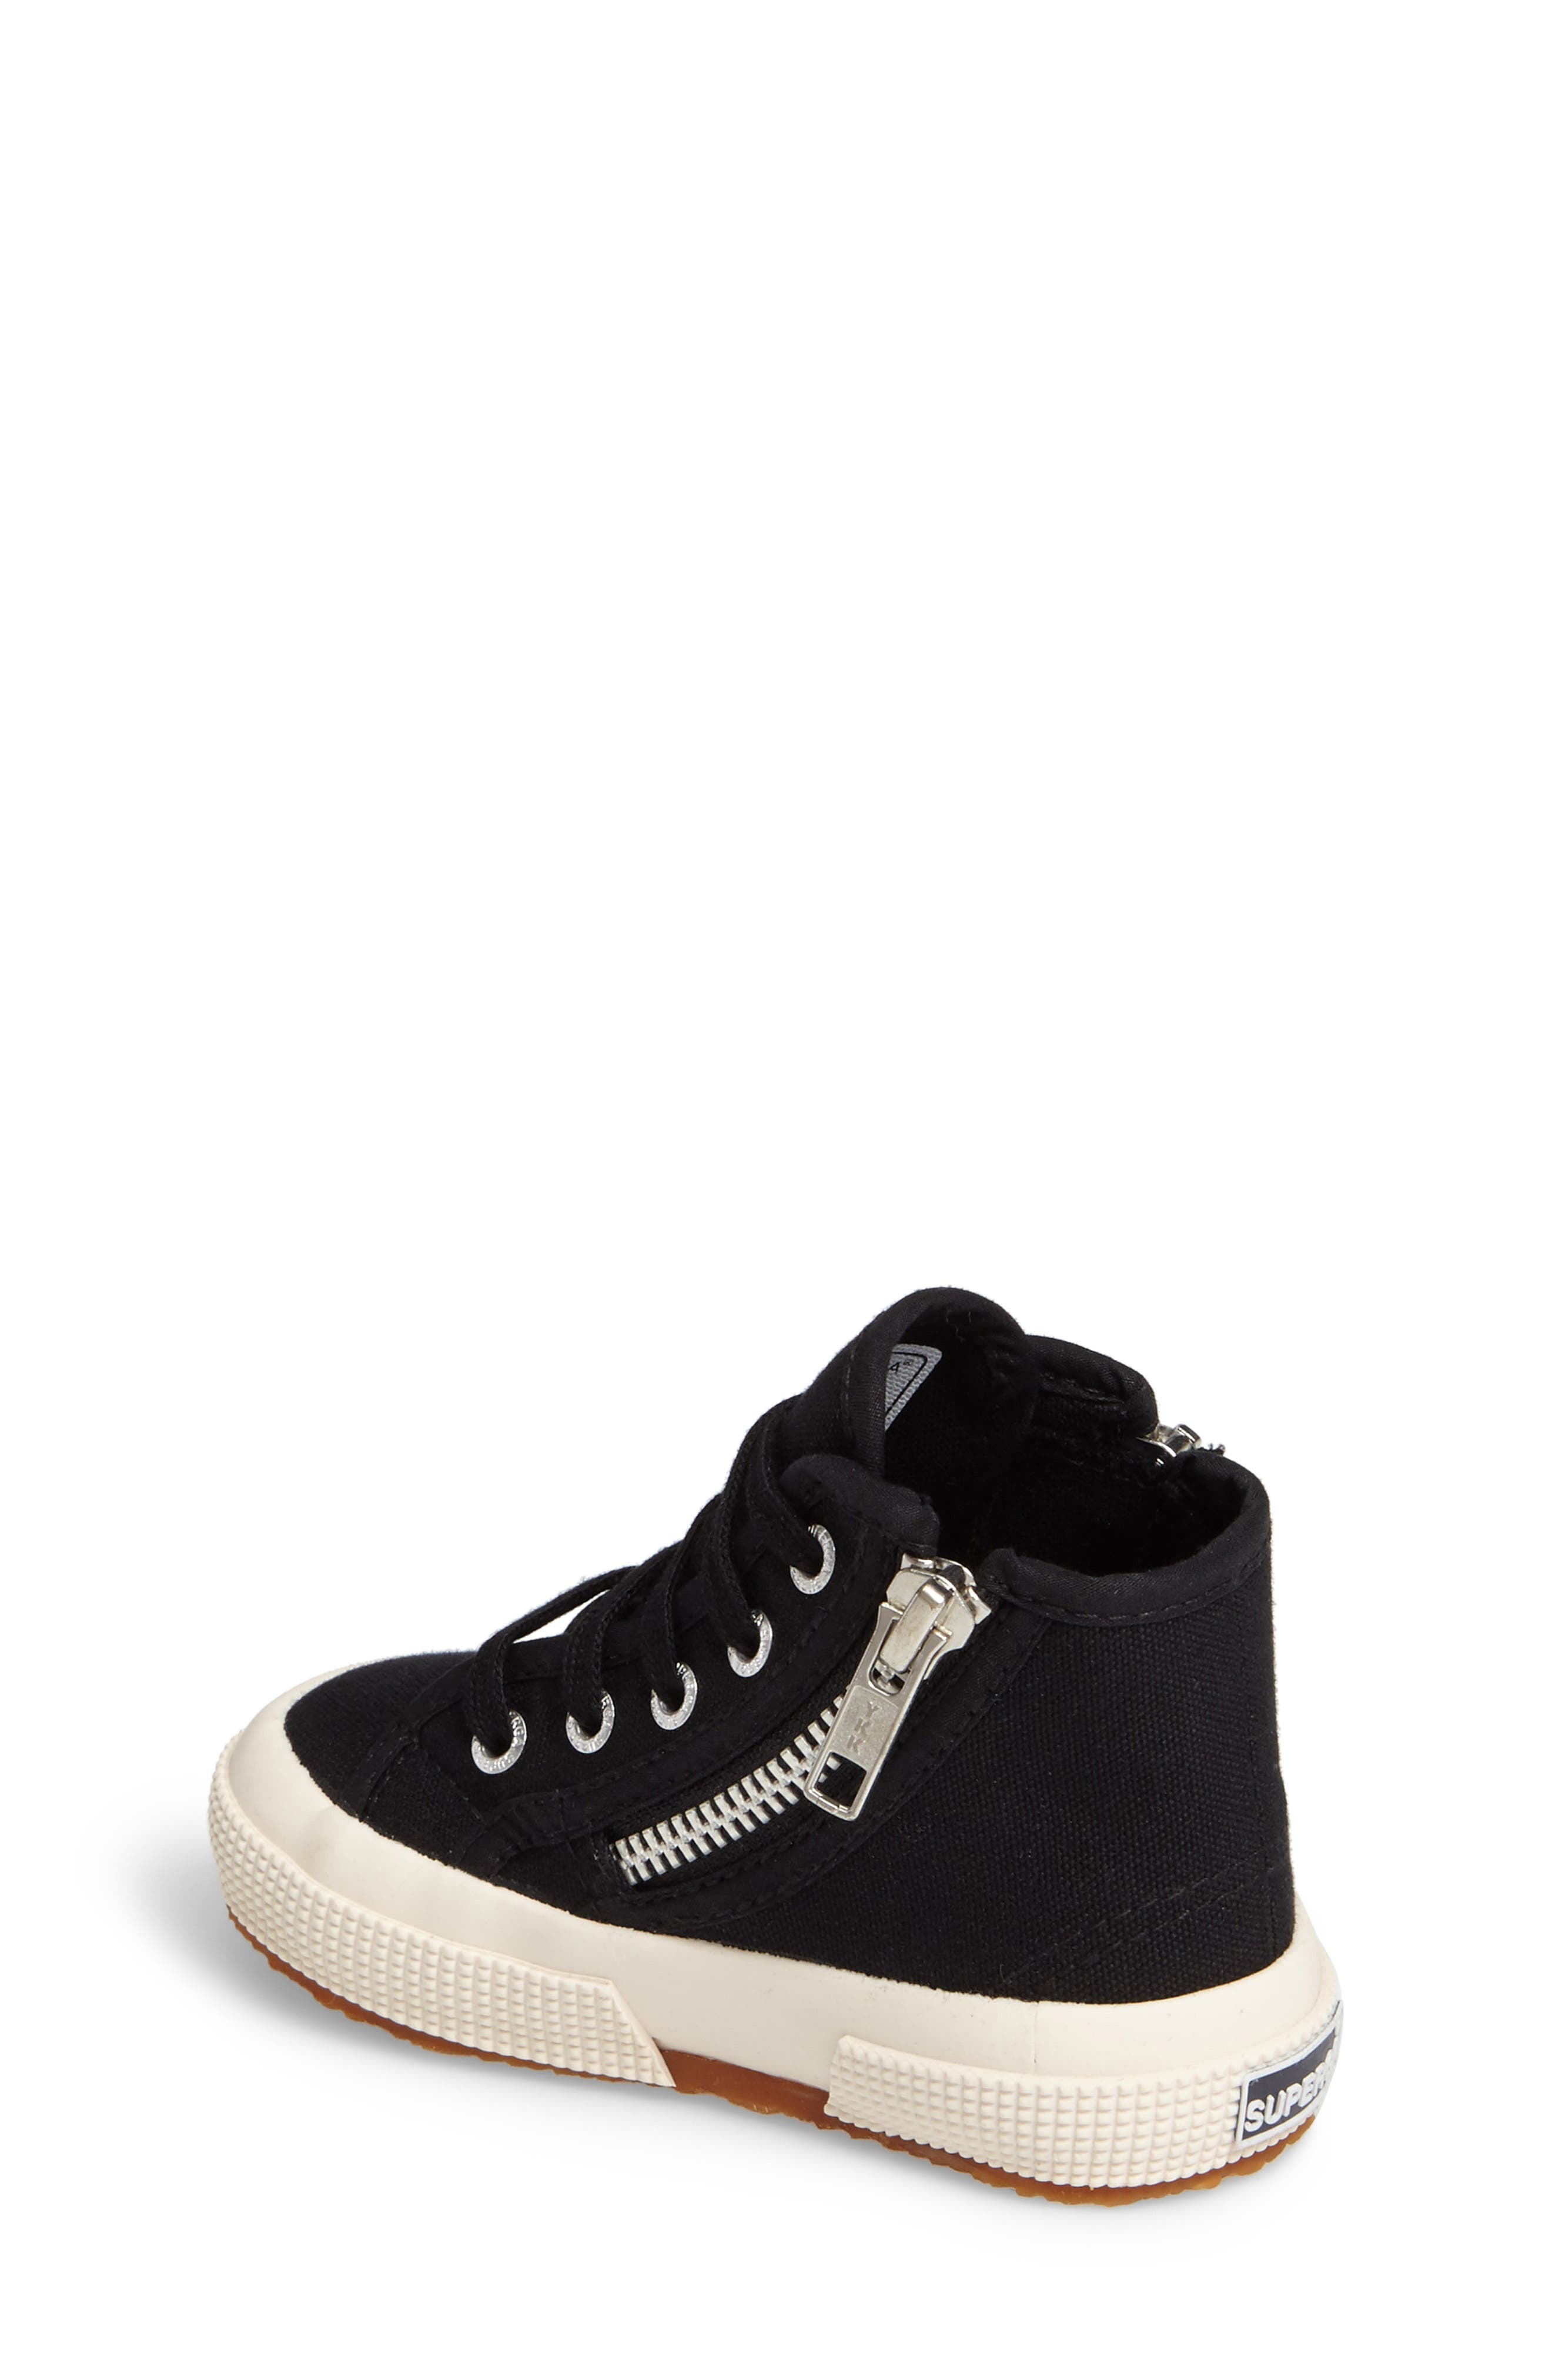 Zip High Top Sneaker,                             Alternate thumbnail 2, color,                             001